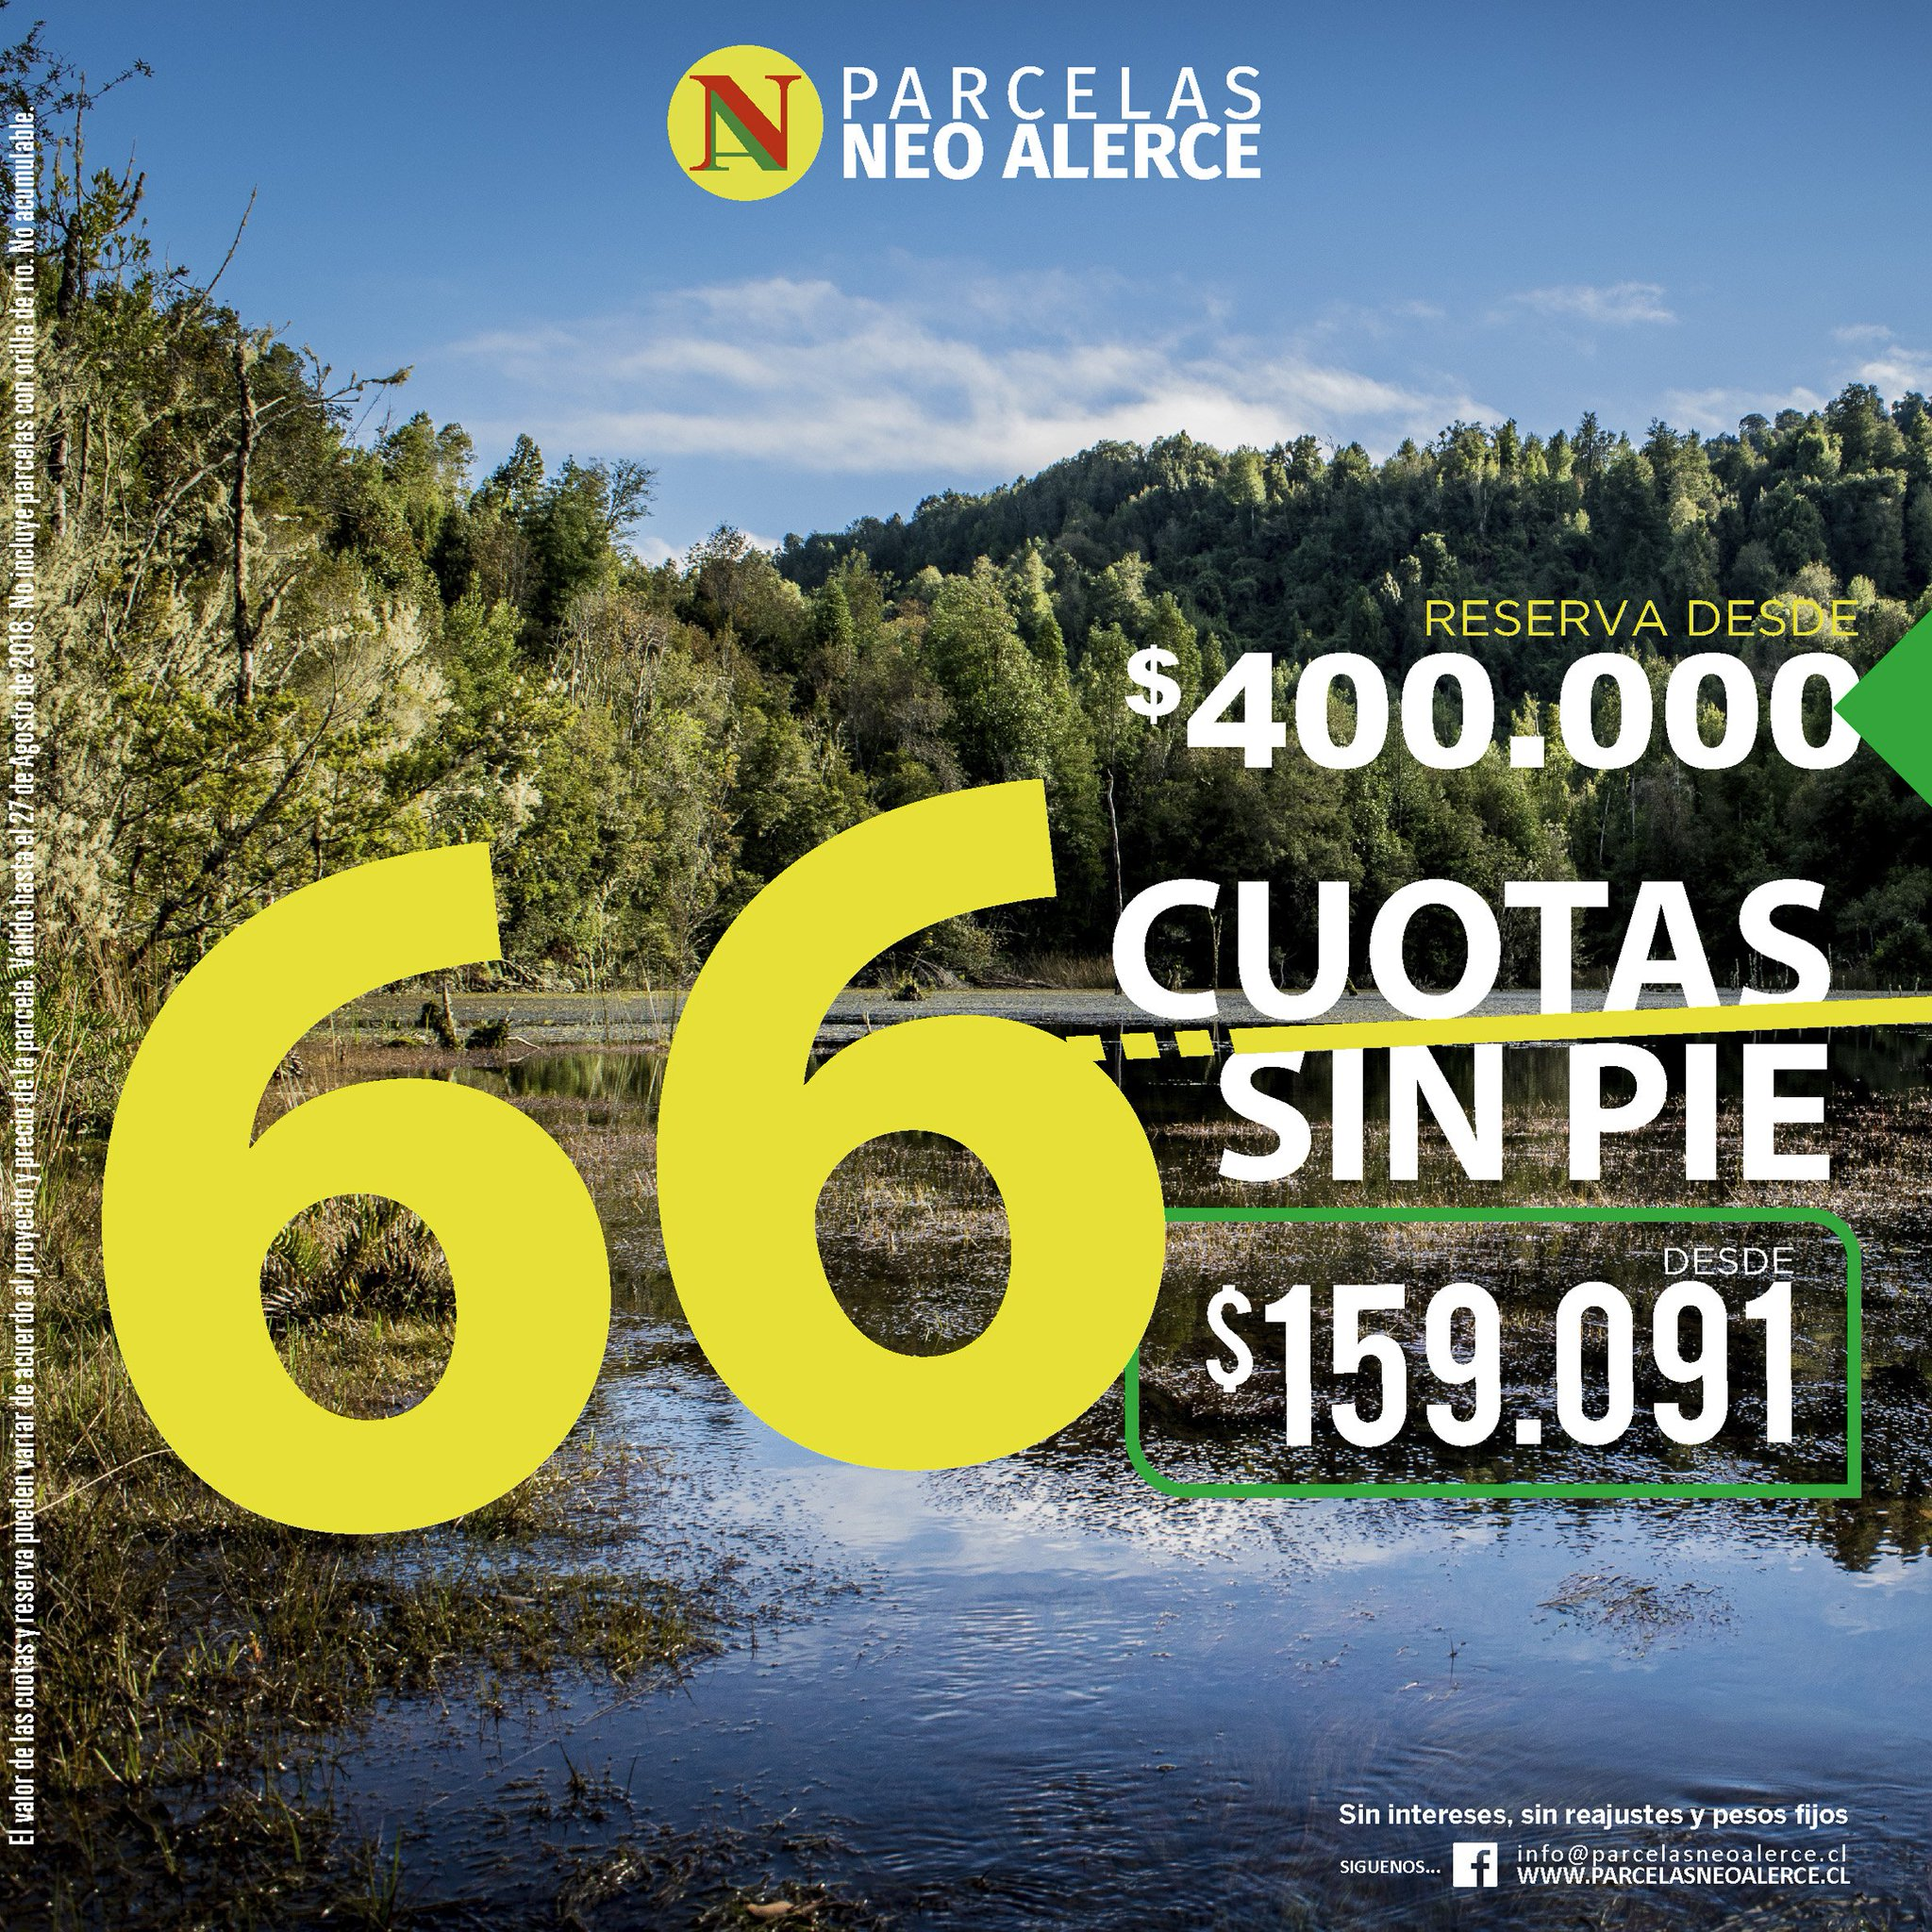 Parcelas Neo Alerce On Twitter Parcelas Hasta En 66 Cuotas